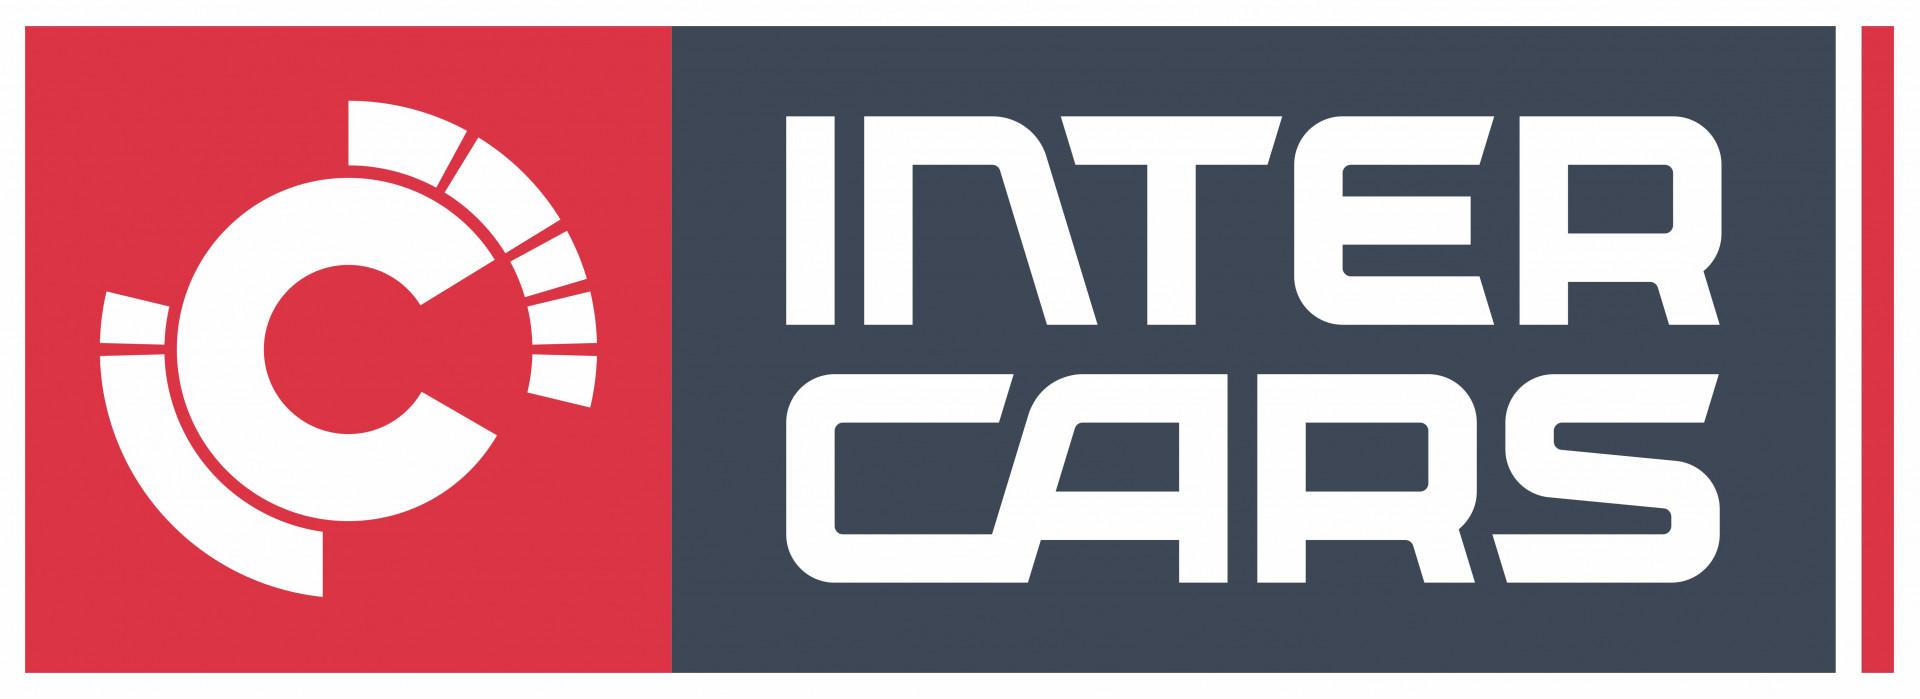 INTERCARS - LOGO.jpg